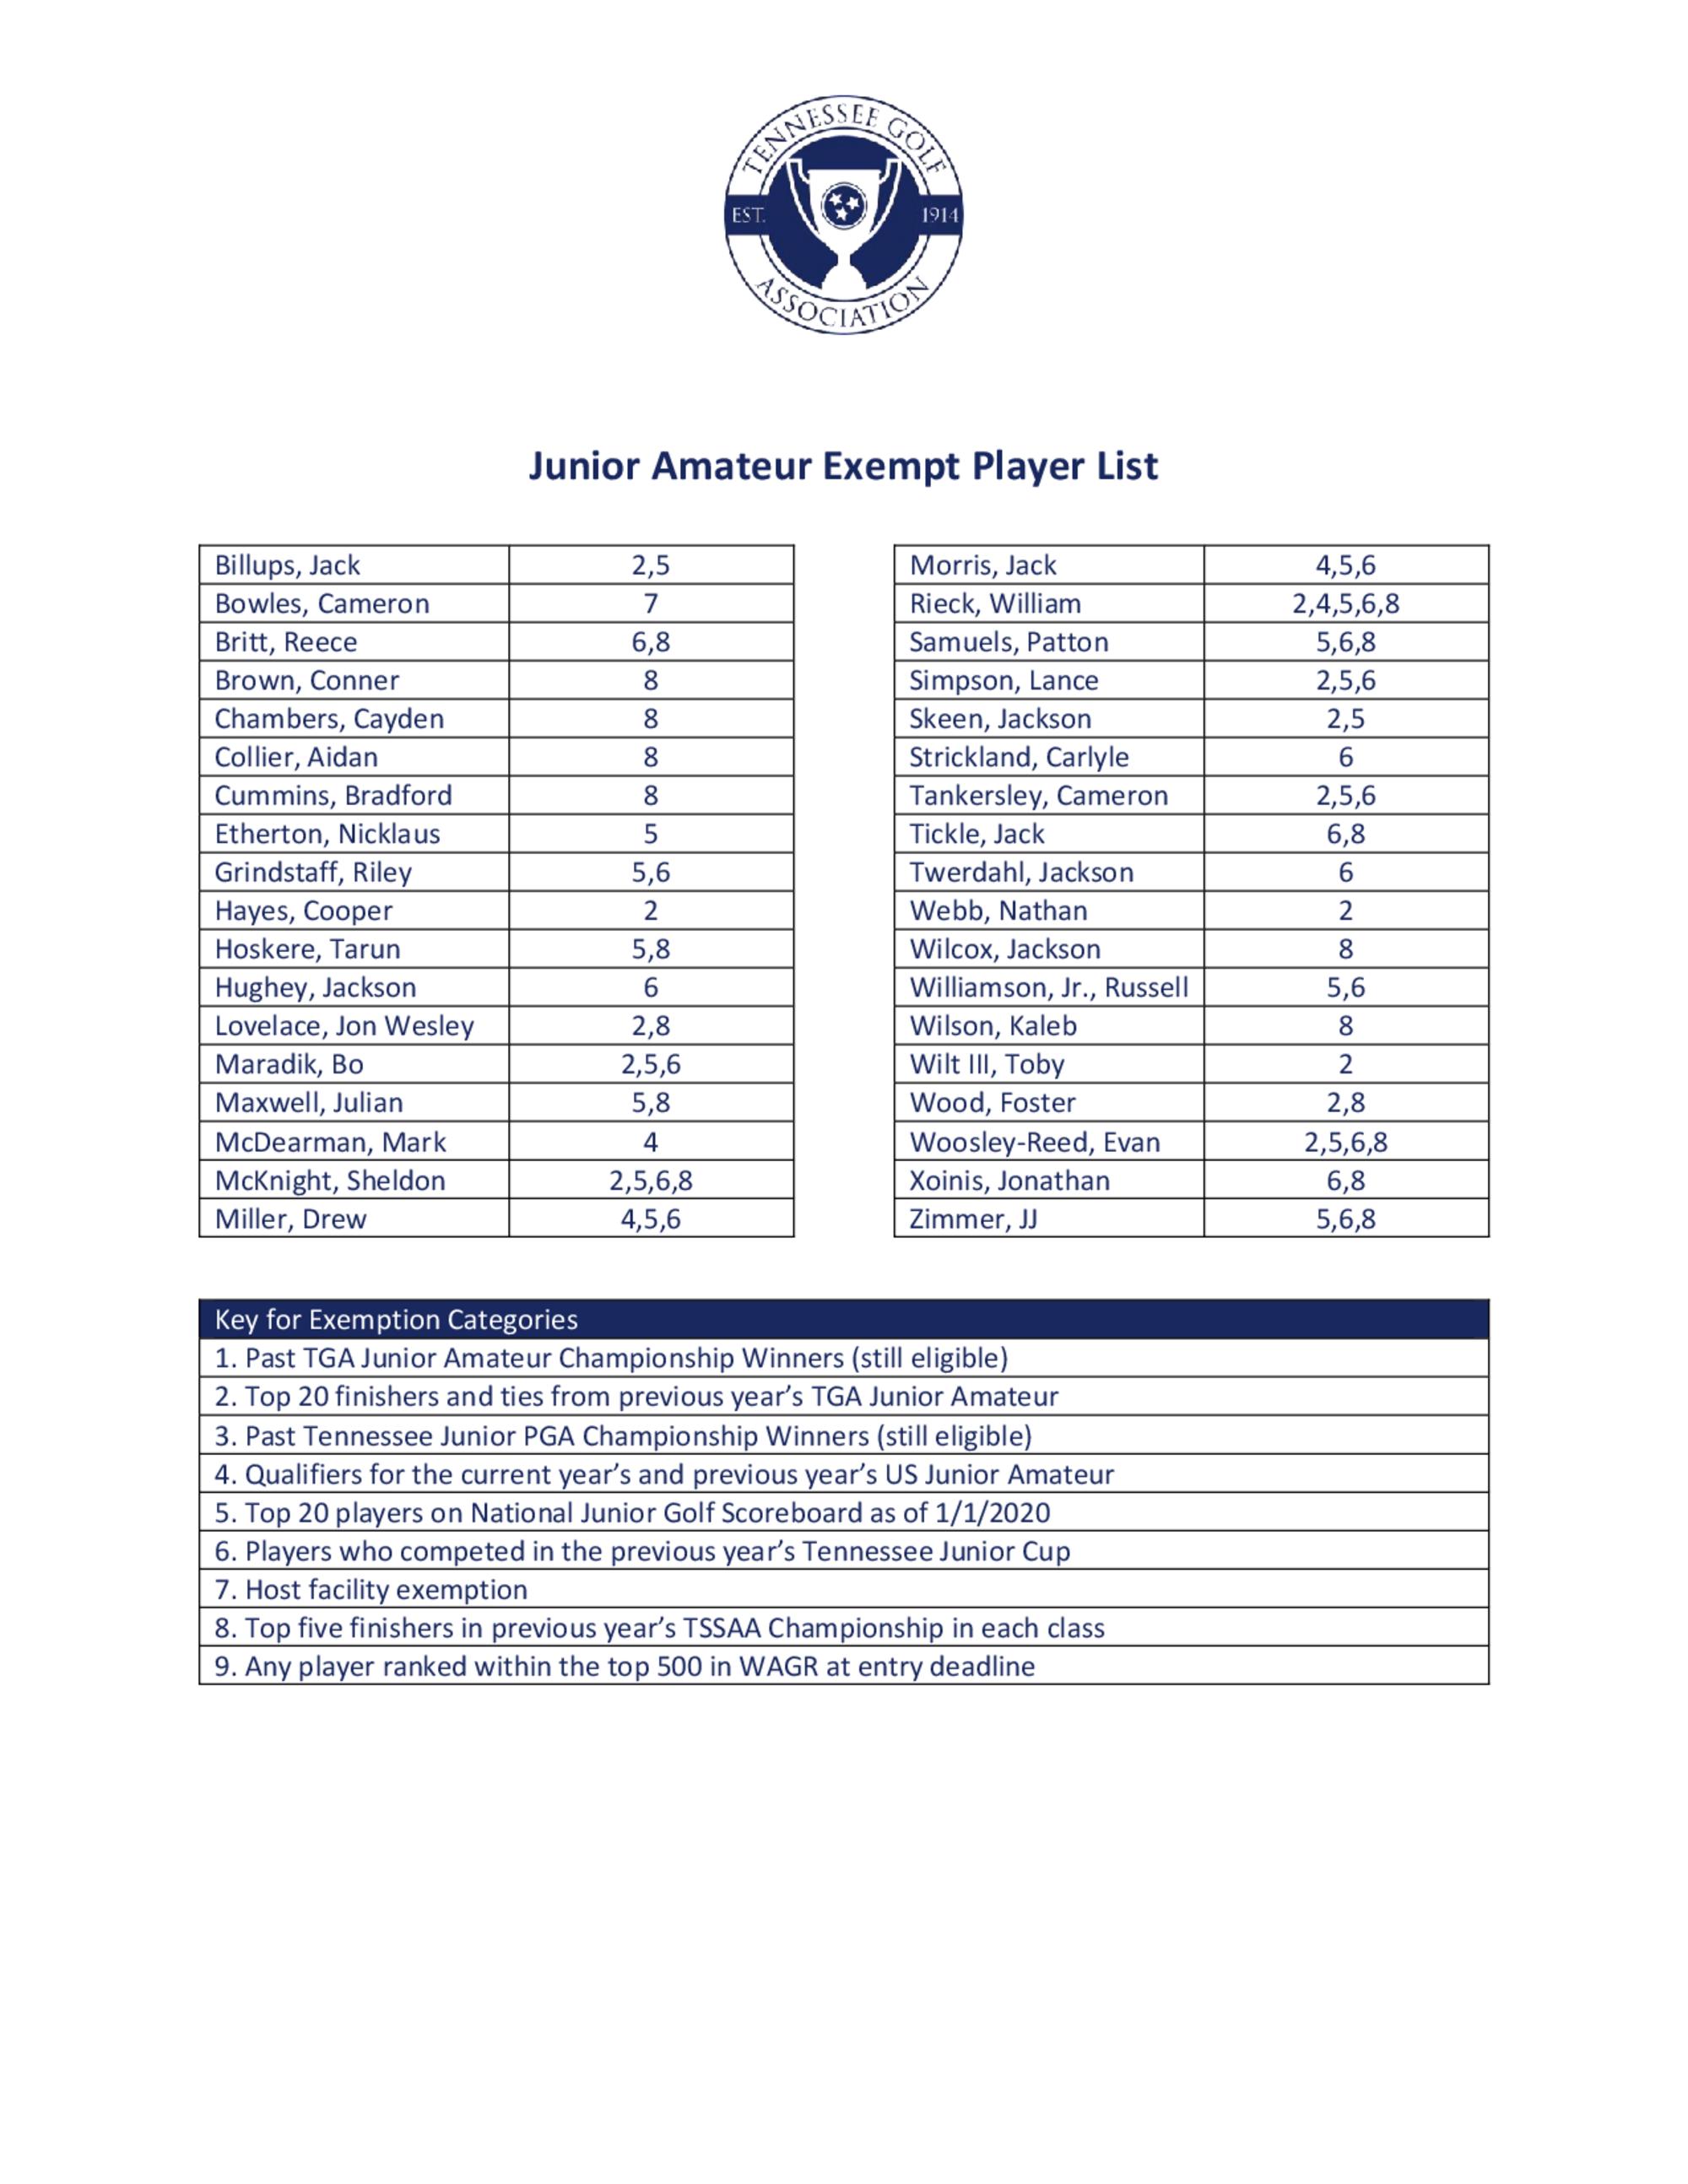 Junior am exemption list 1